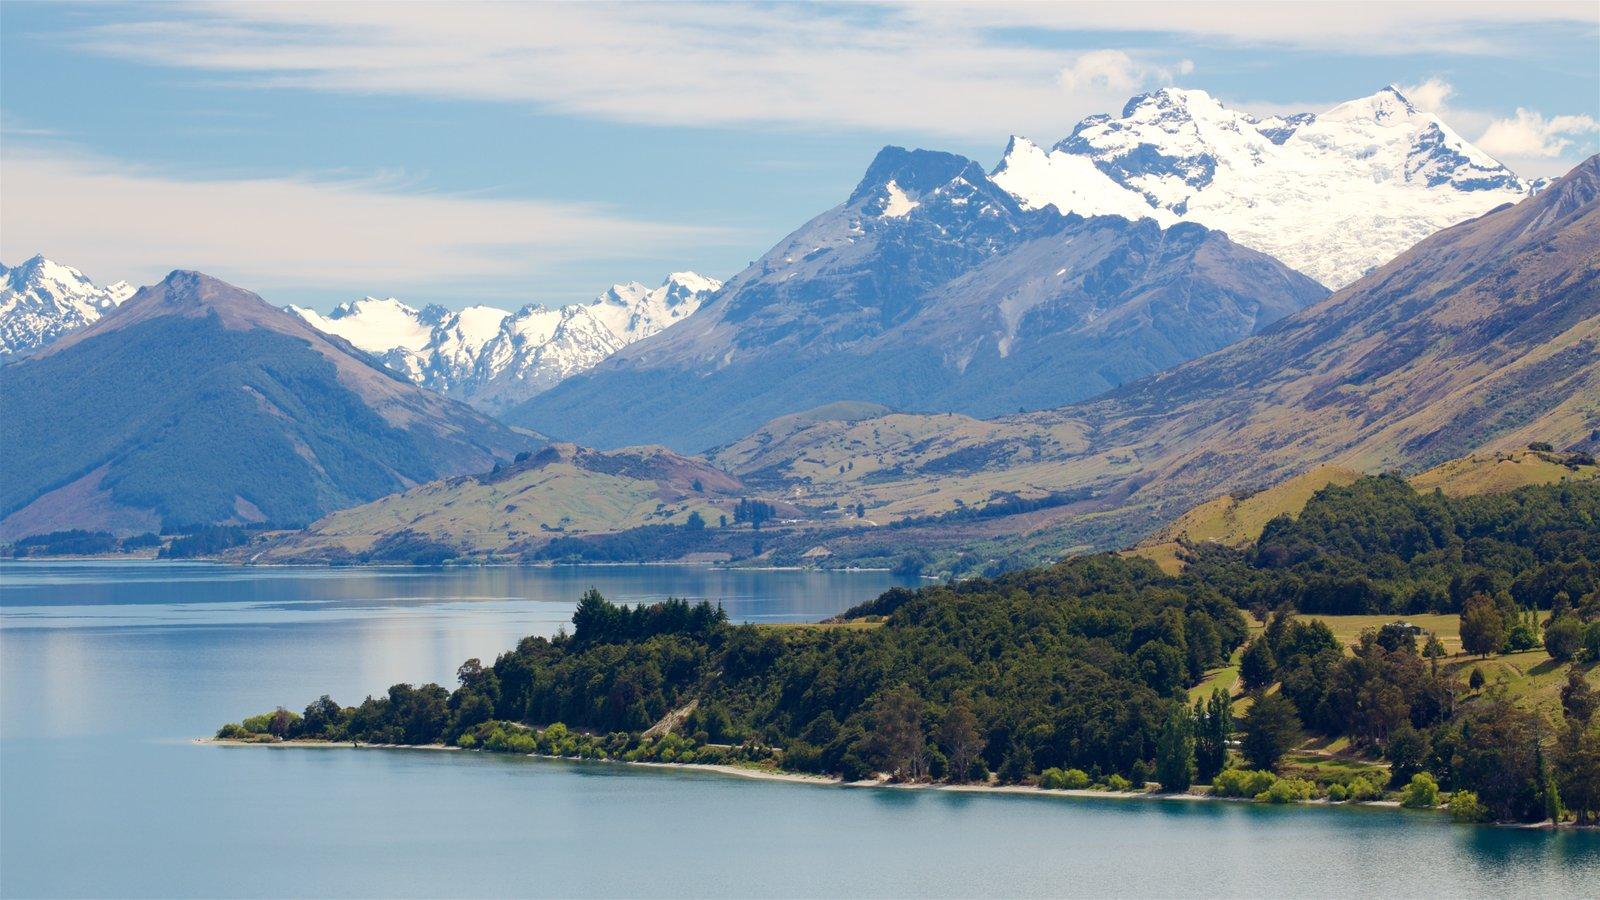 Lake Wakatipu showing mountains, snow and a lake or waterhole